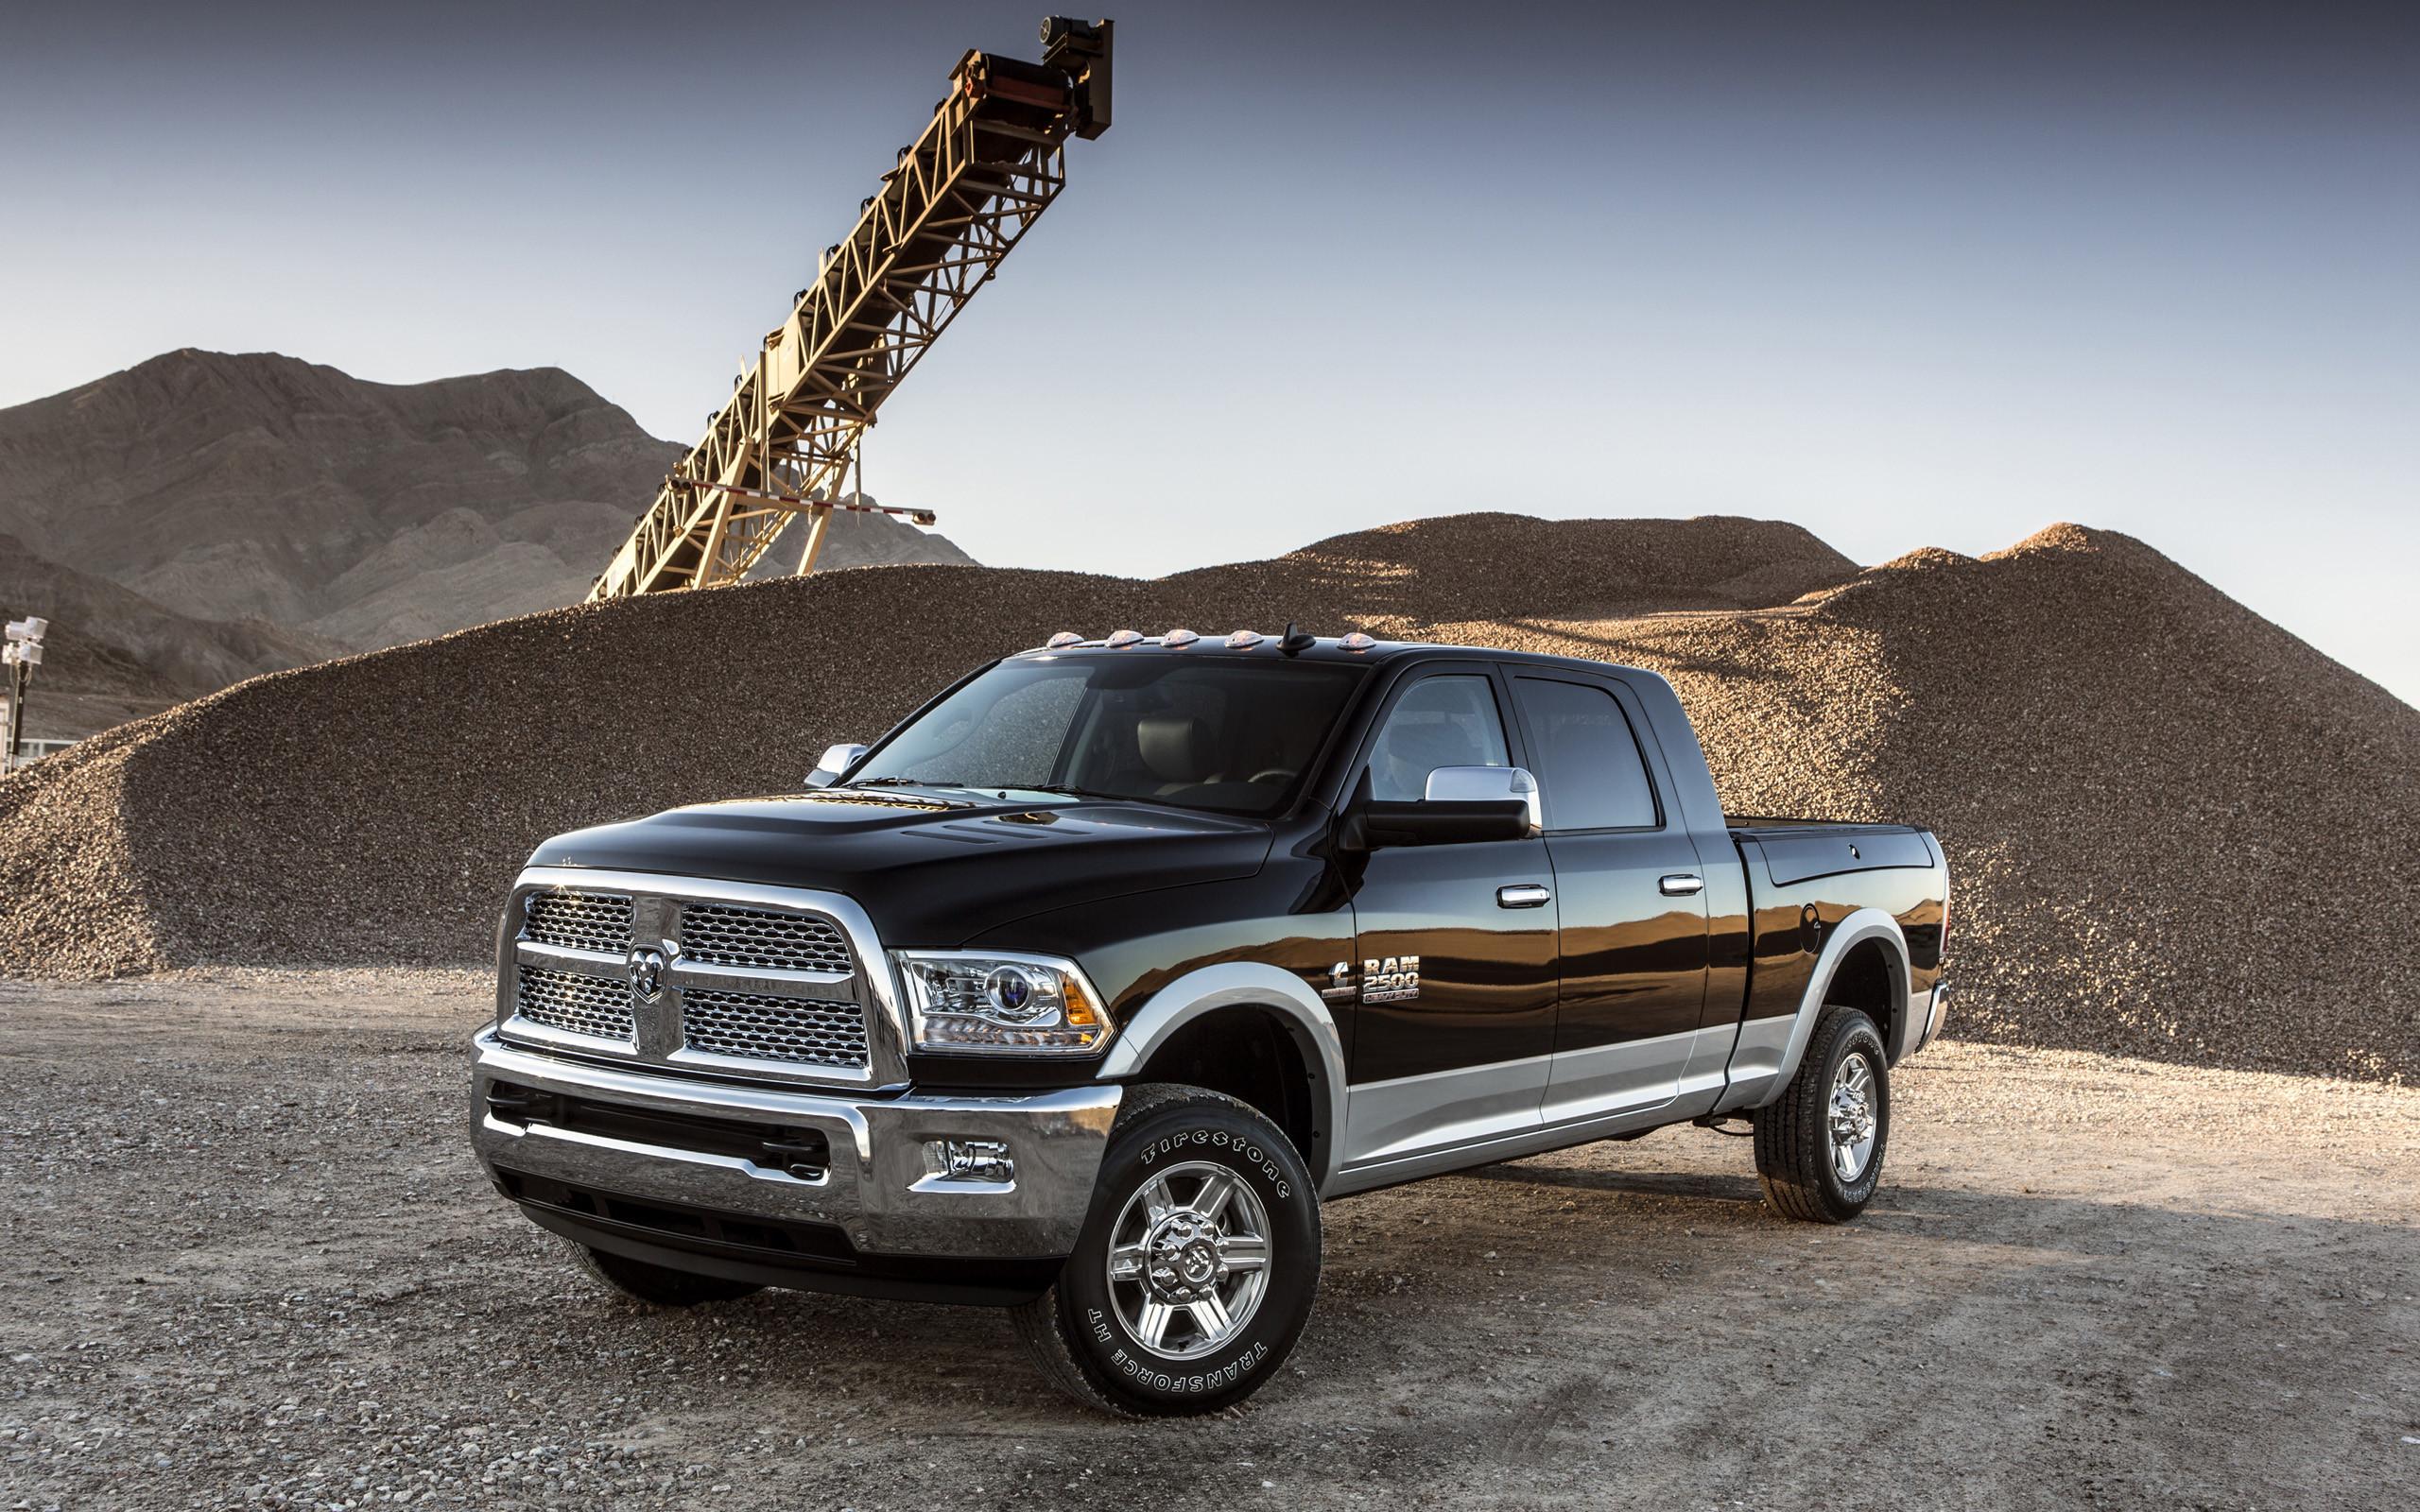 2013 Dodge Ram 2500 4×4 truck wallpaper | | 112290 .